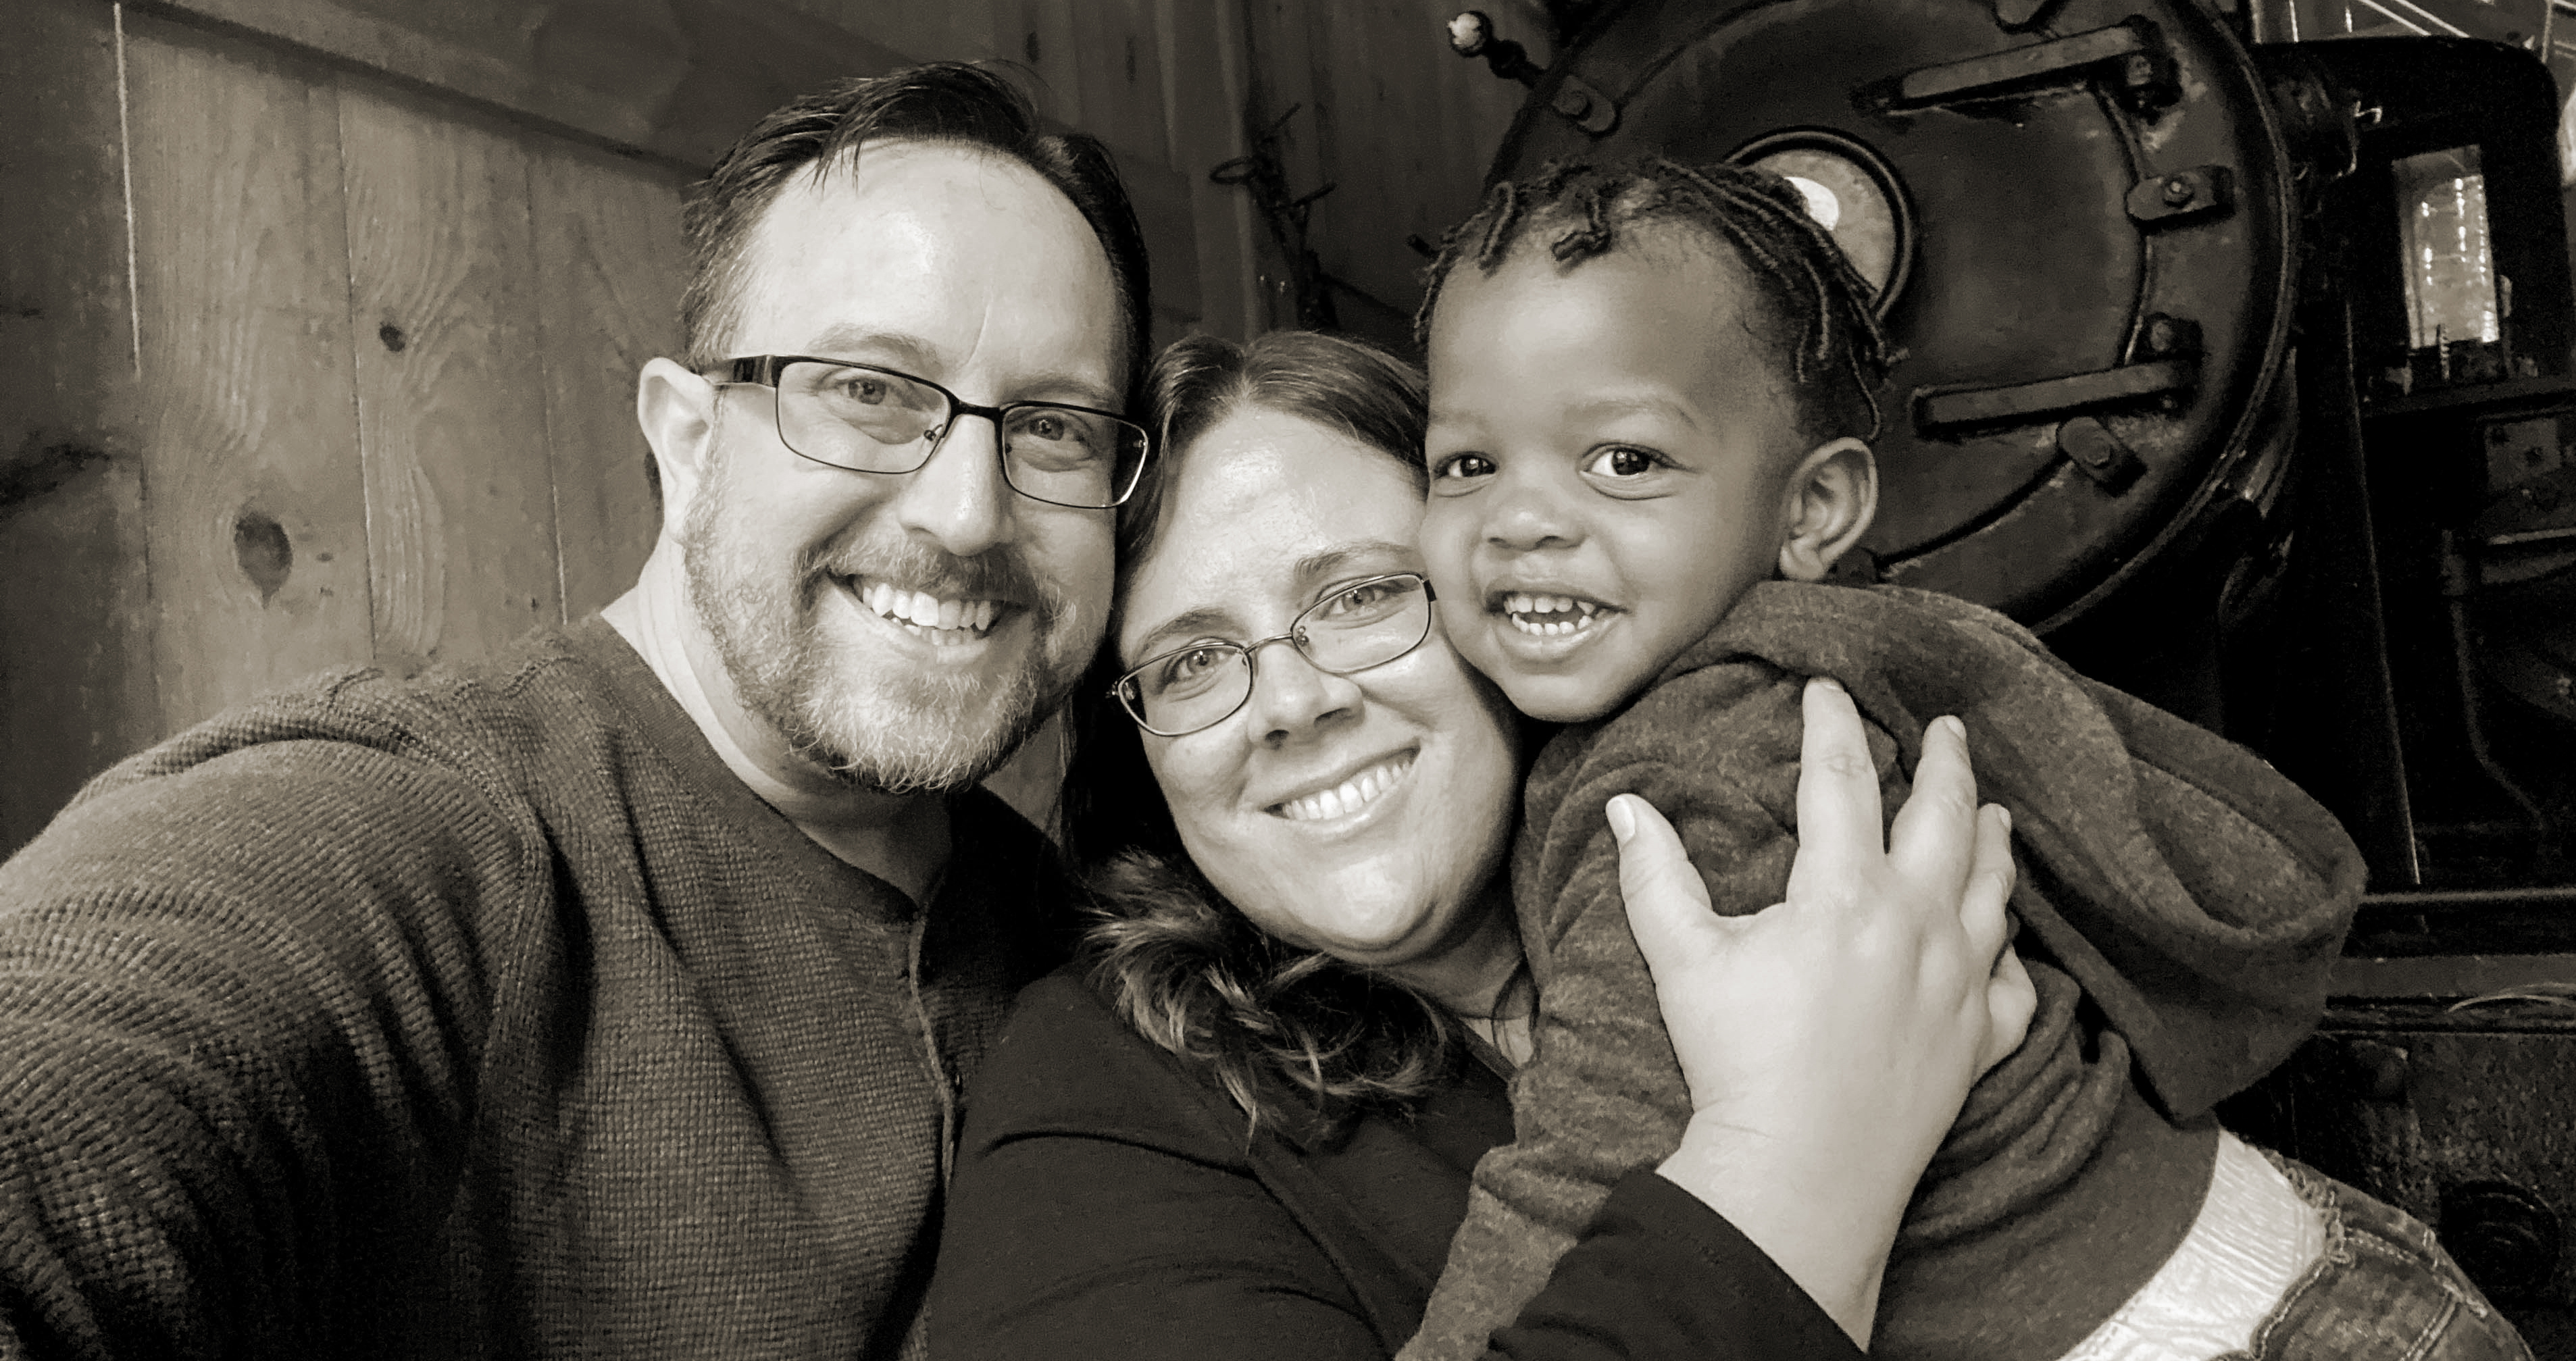 The Hall Family Adoption